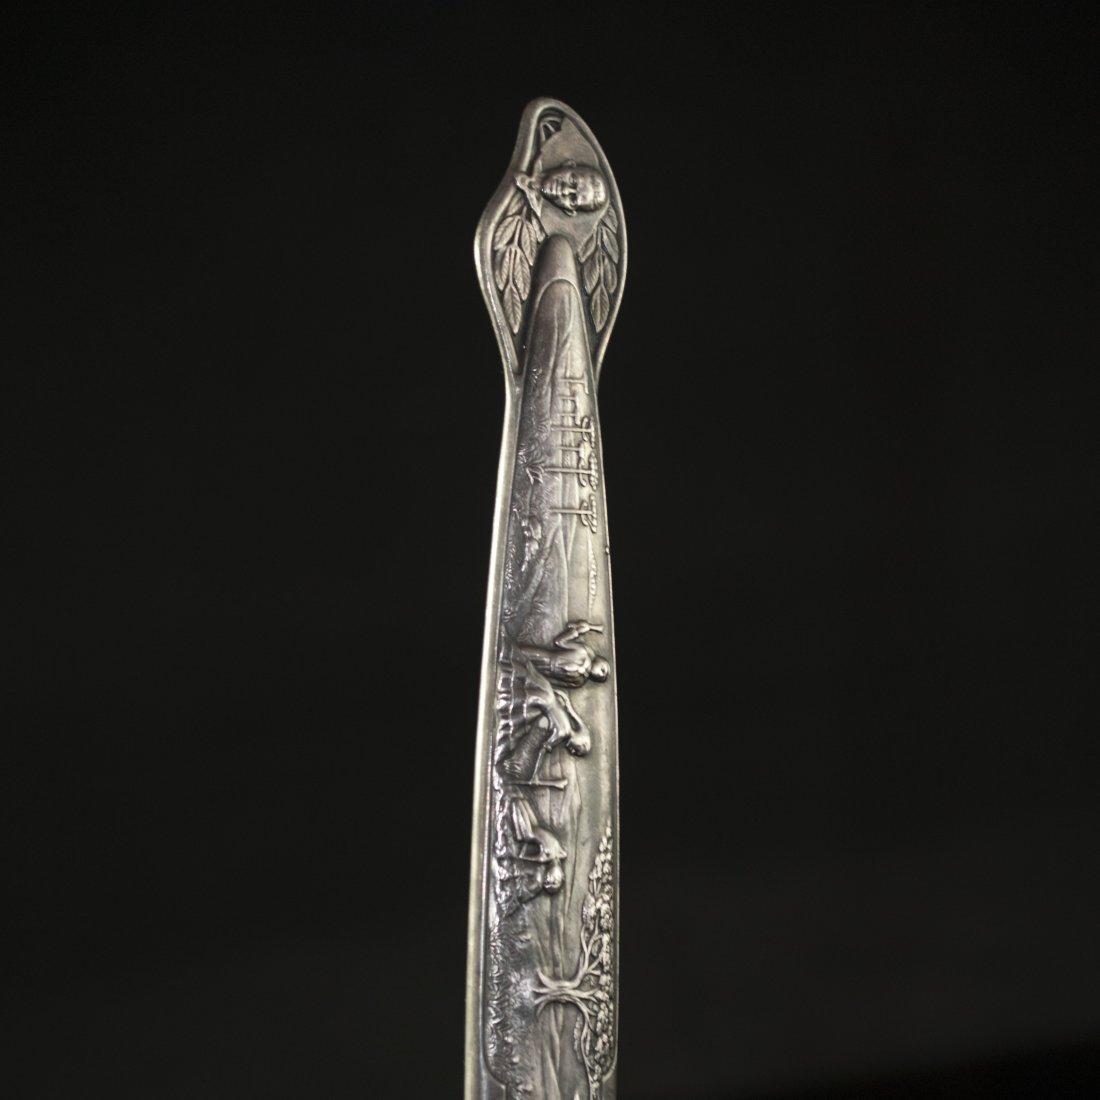 Eberle Inox Silver Gaucho Knife - 2